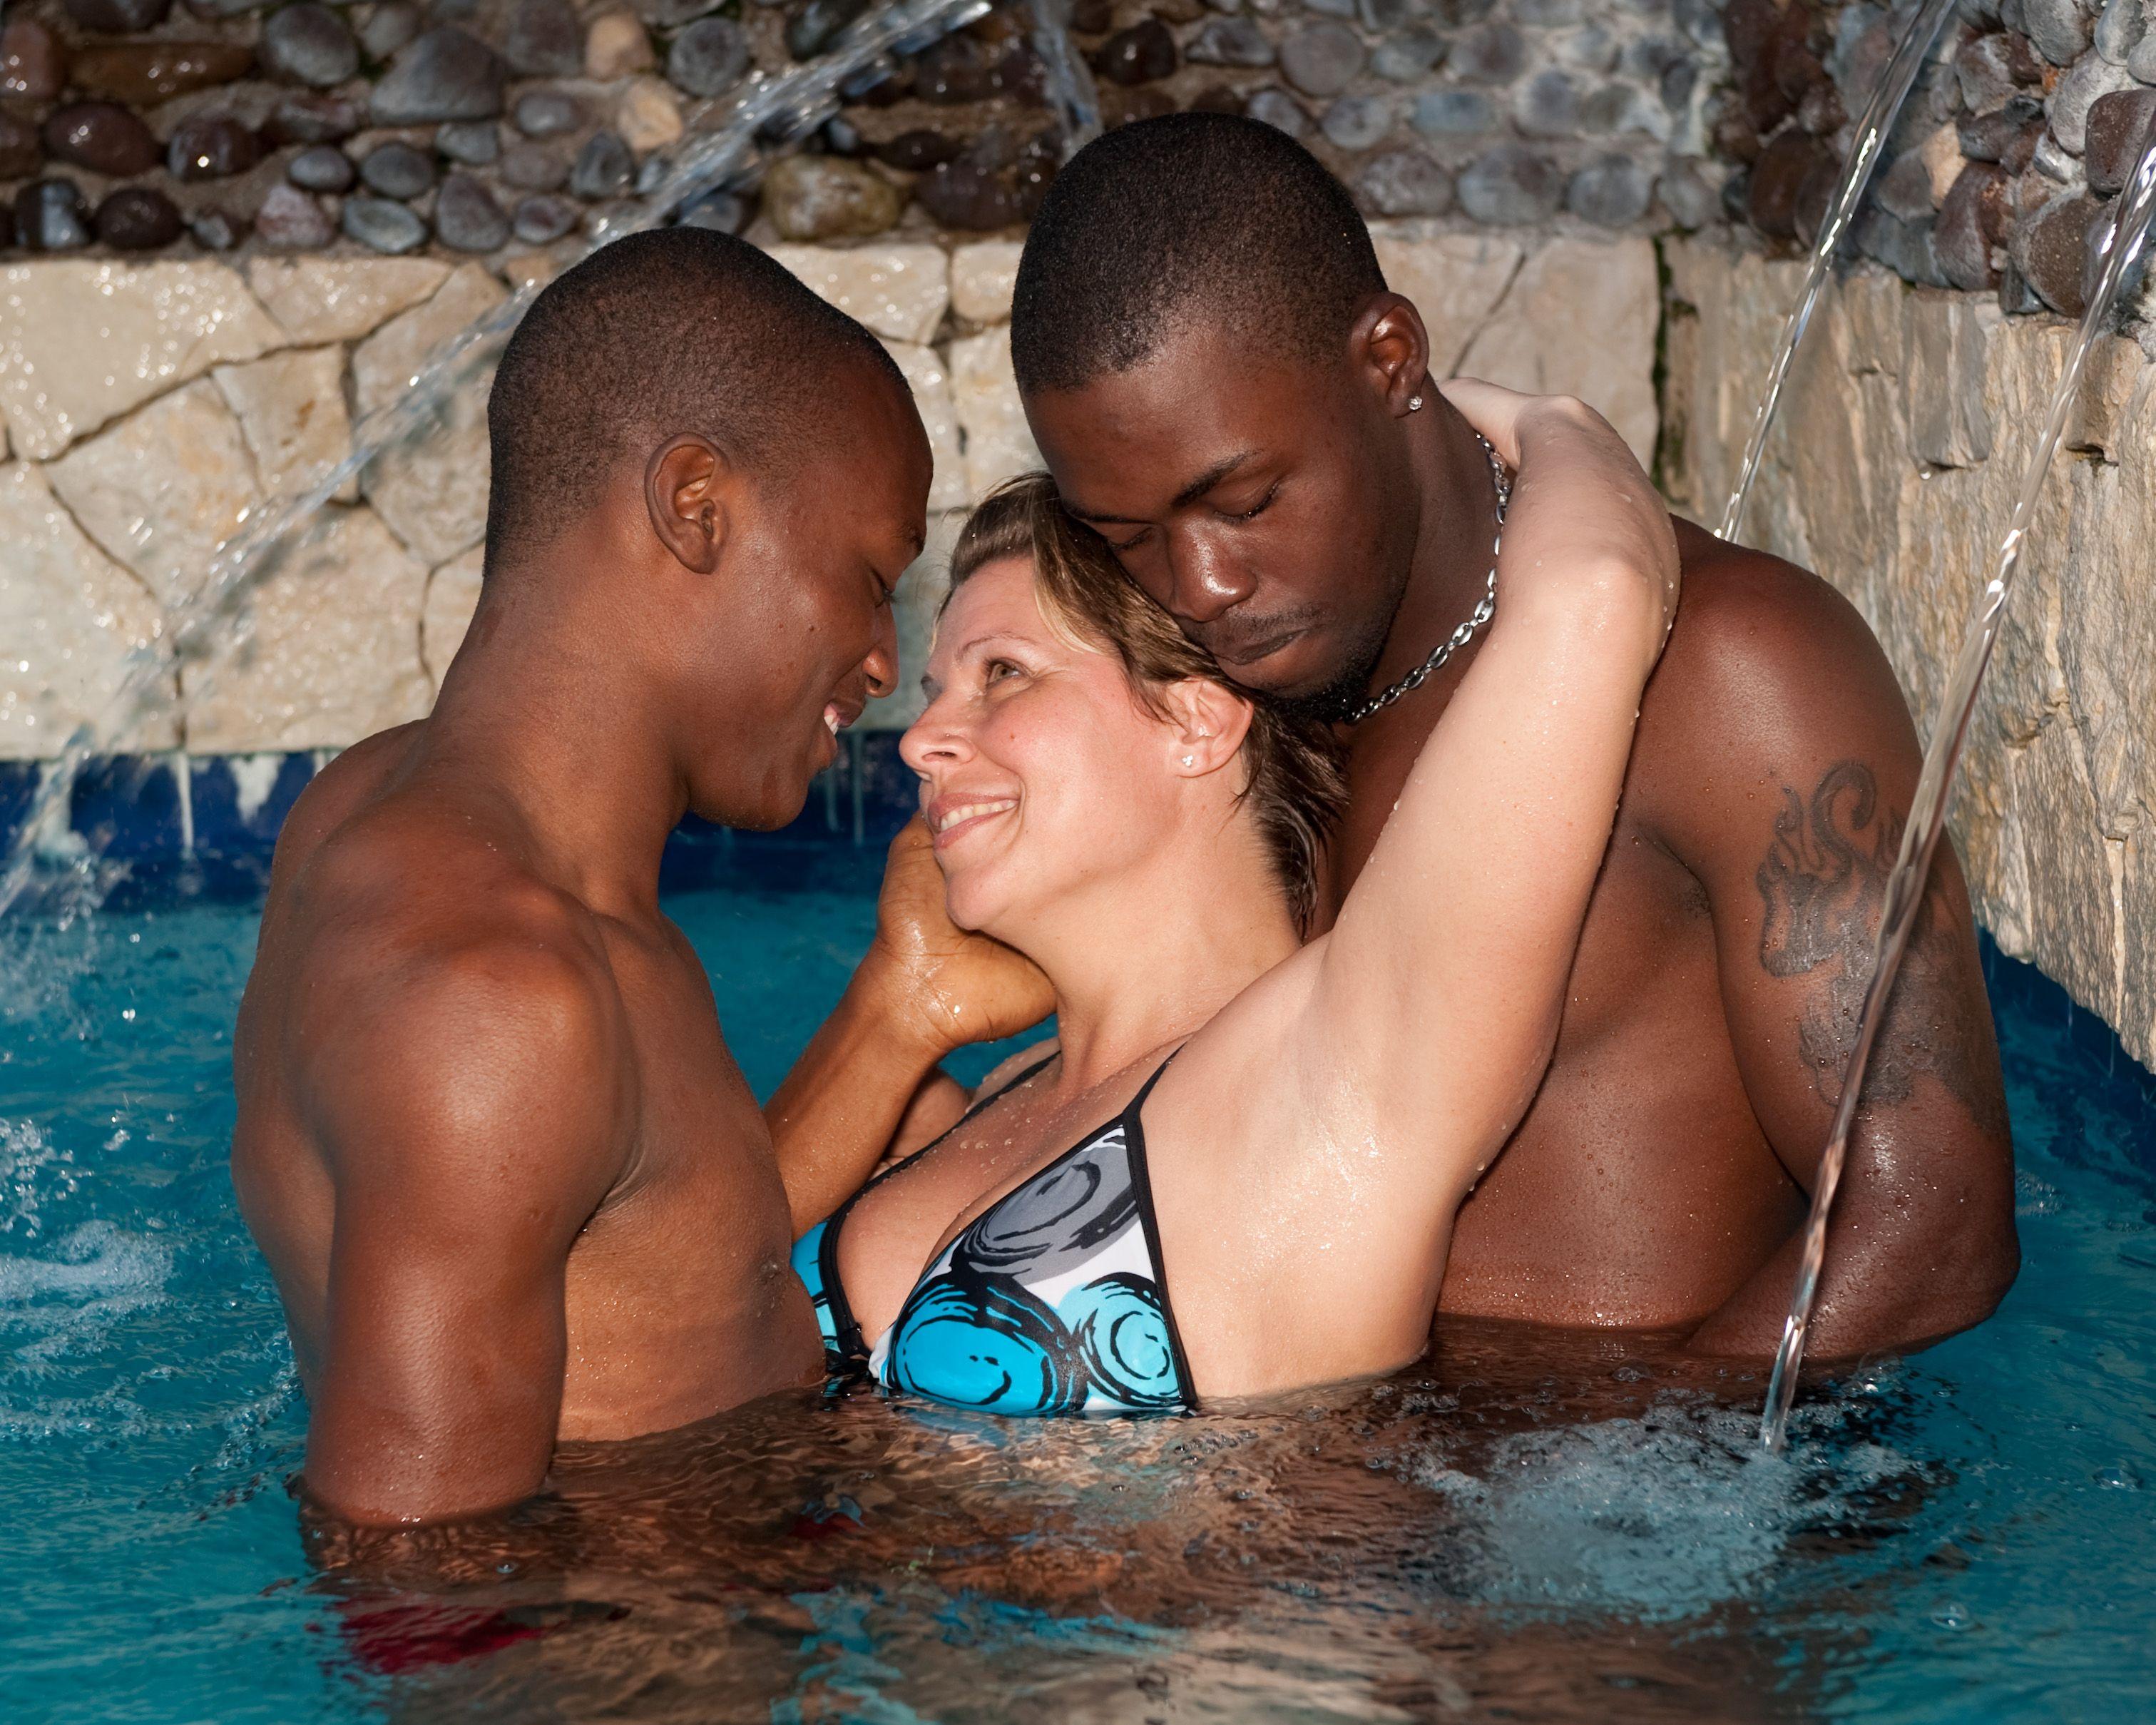 adult hedonism jamaica video jpg 1500x1000